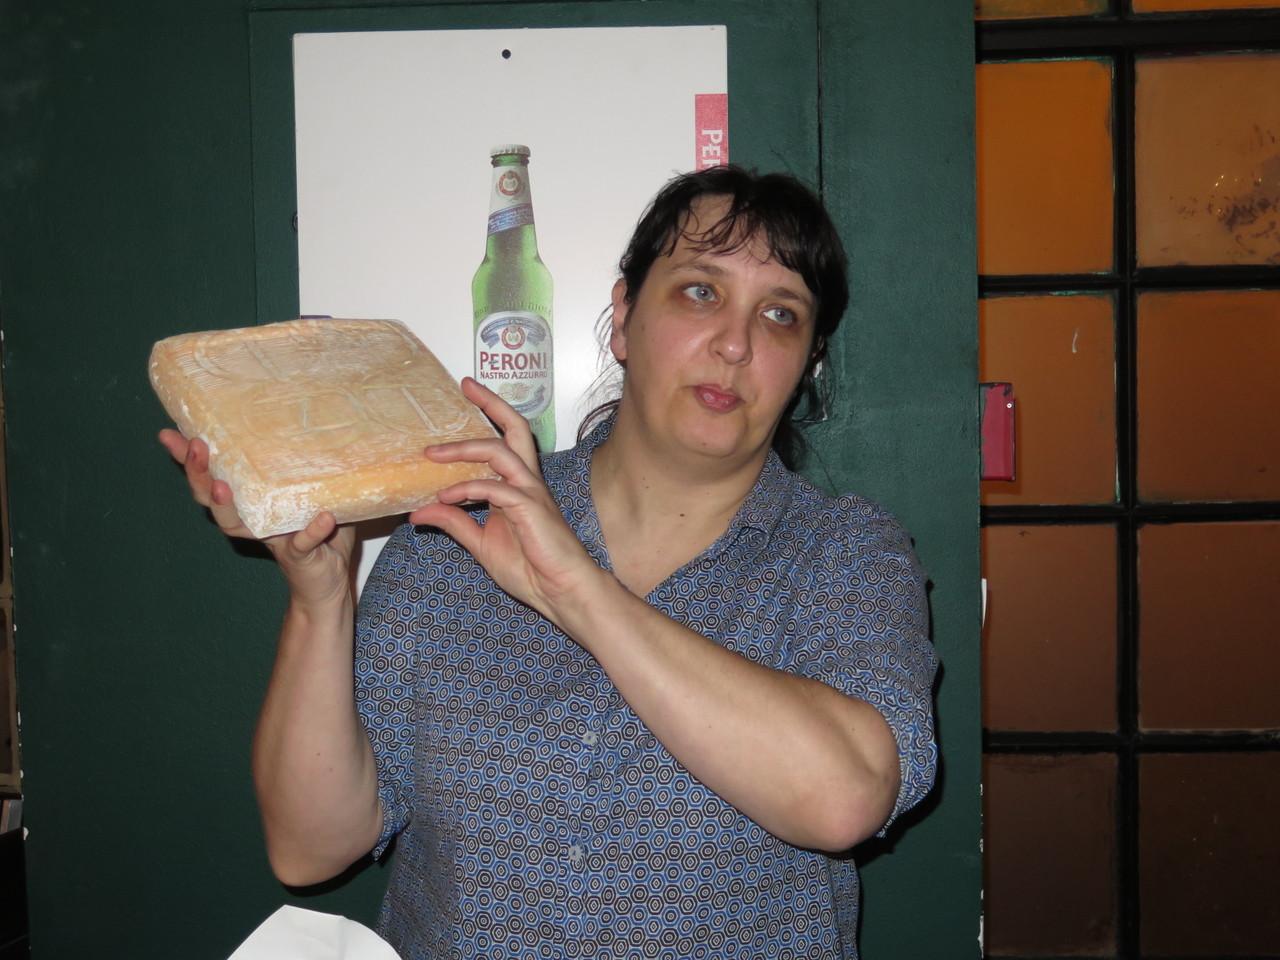 Chiara Ferro e o queijo Taleggio